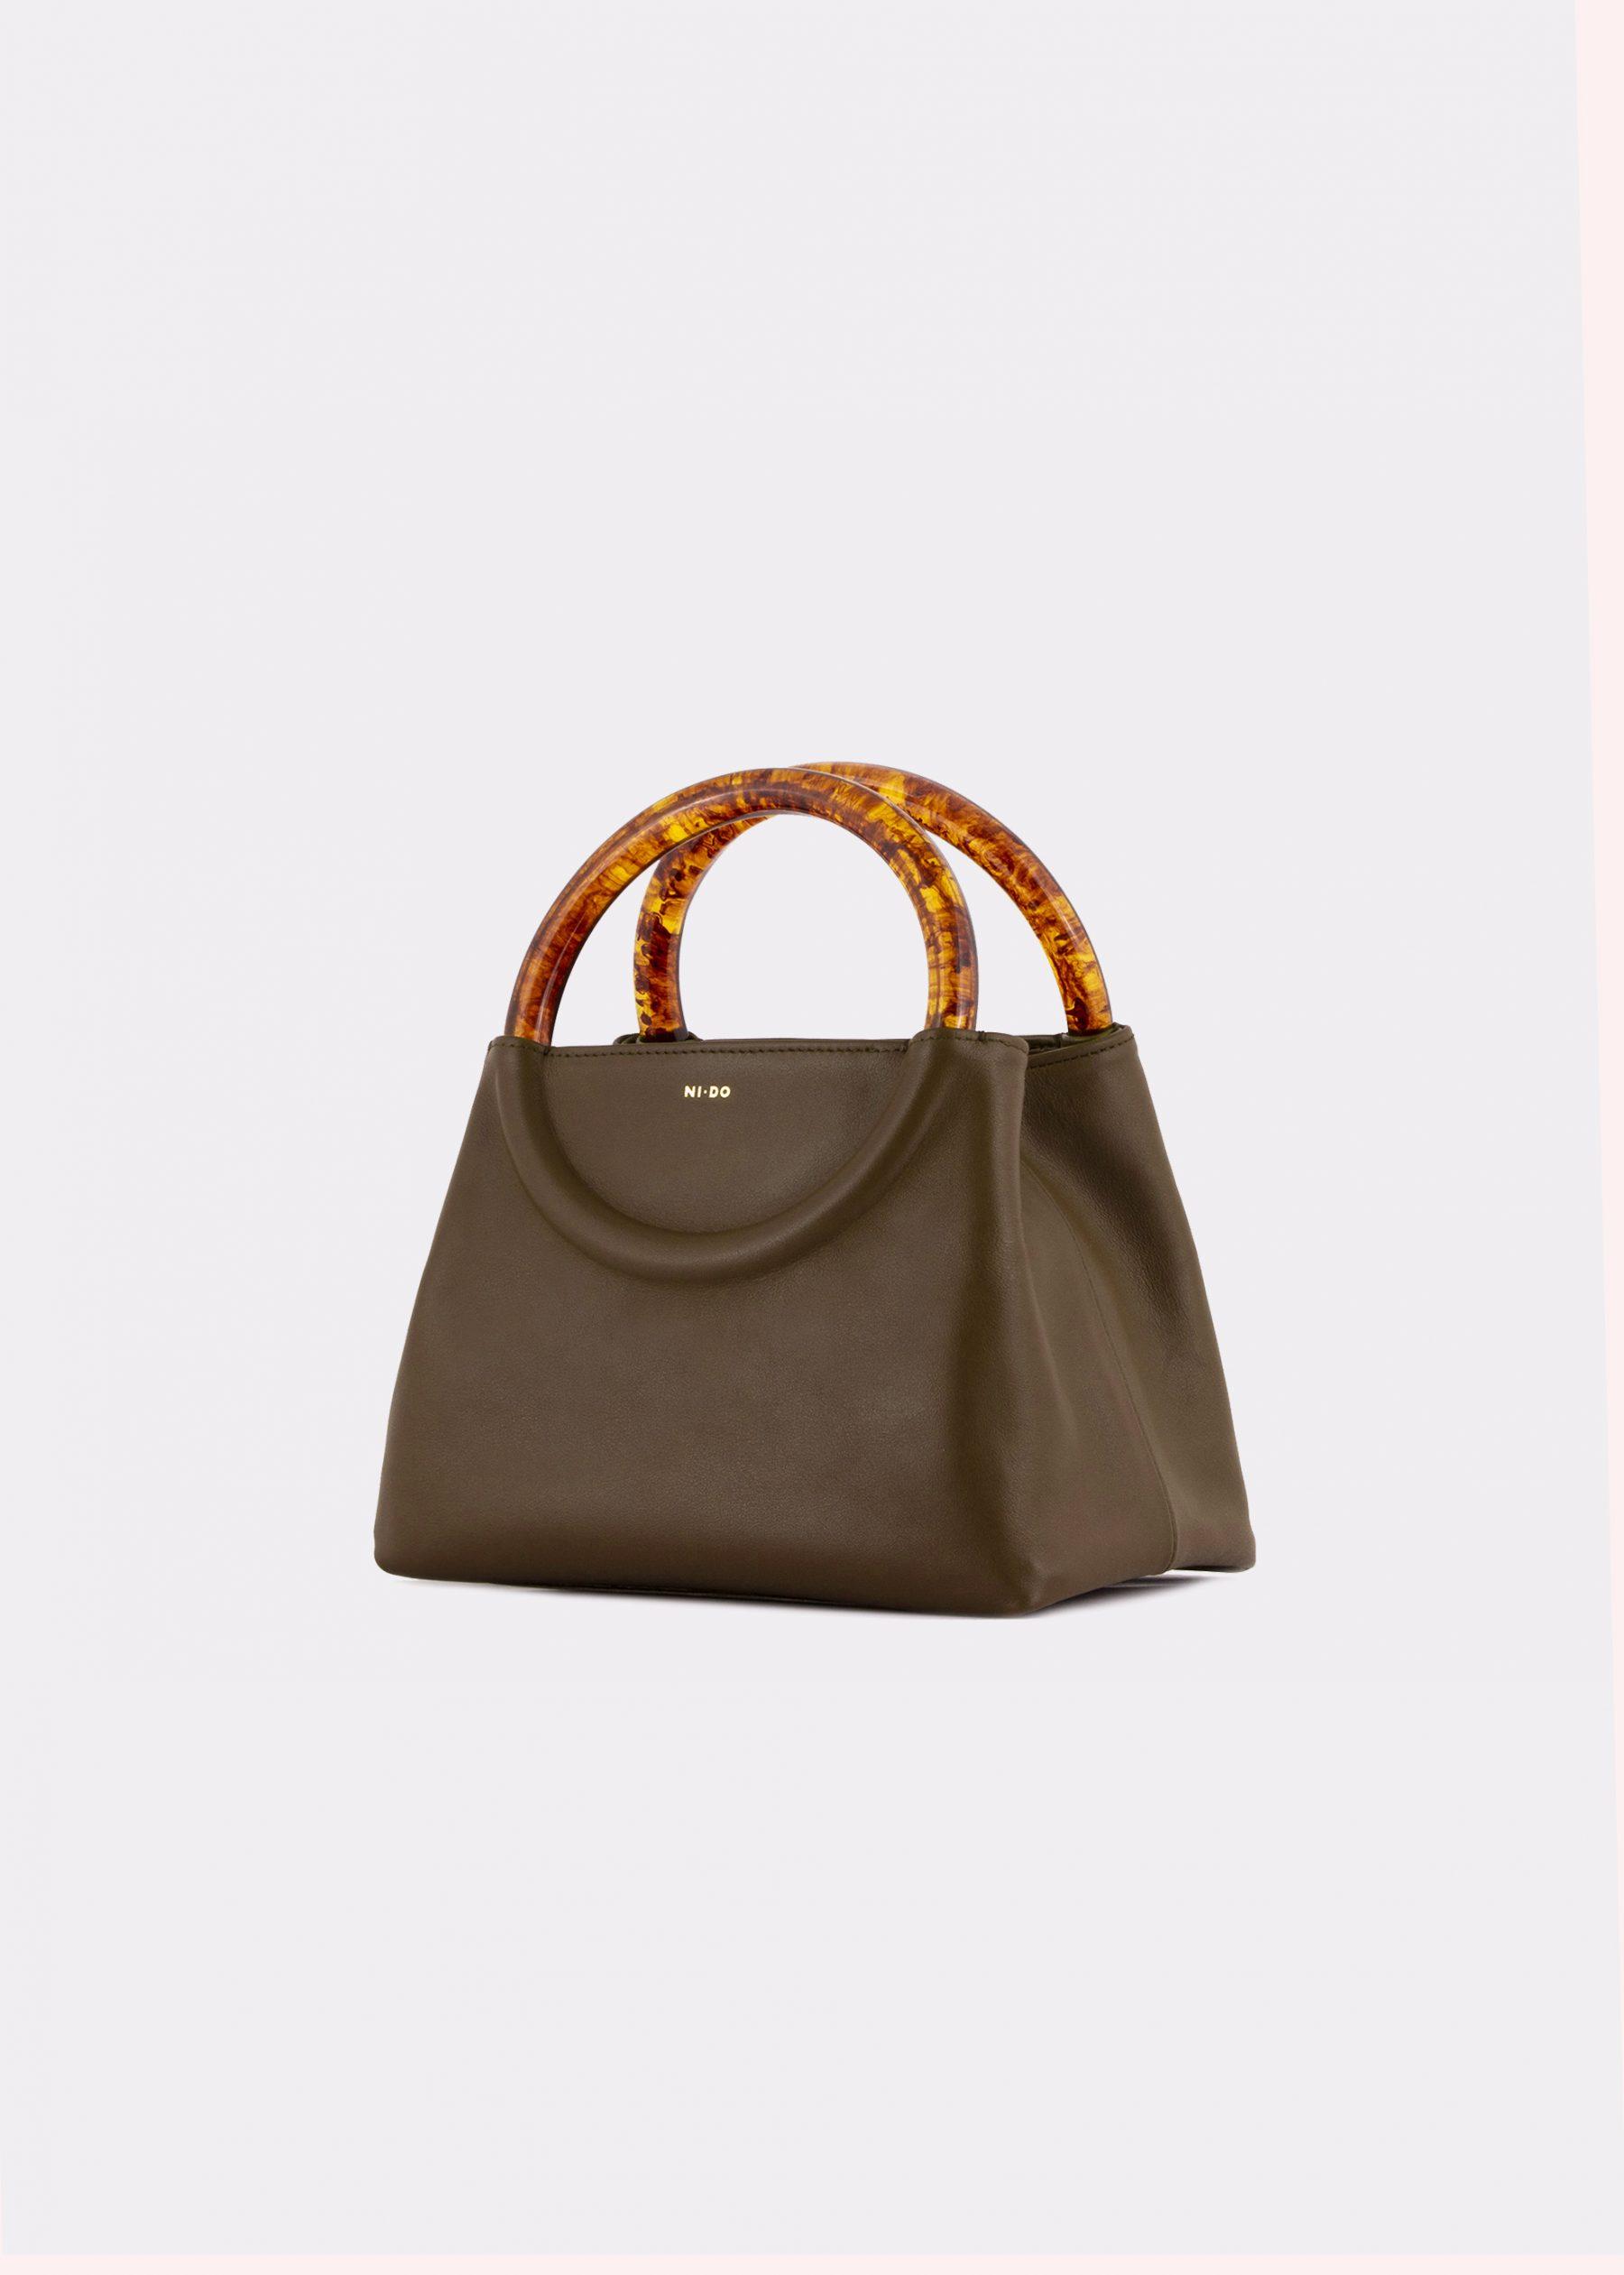 NIDO Bolla Mini bag, Olive, side view